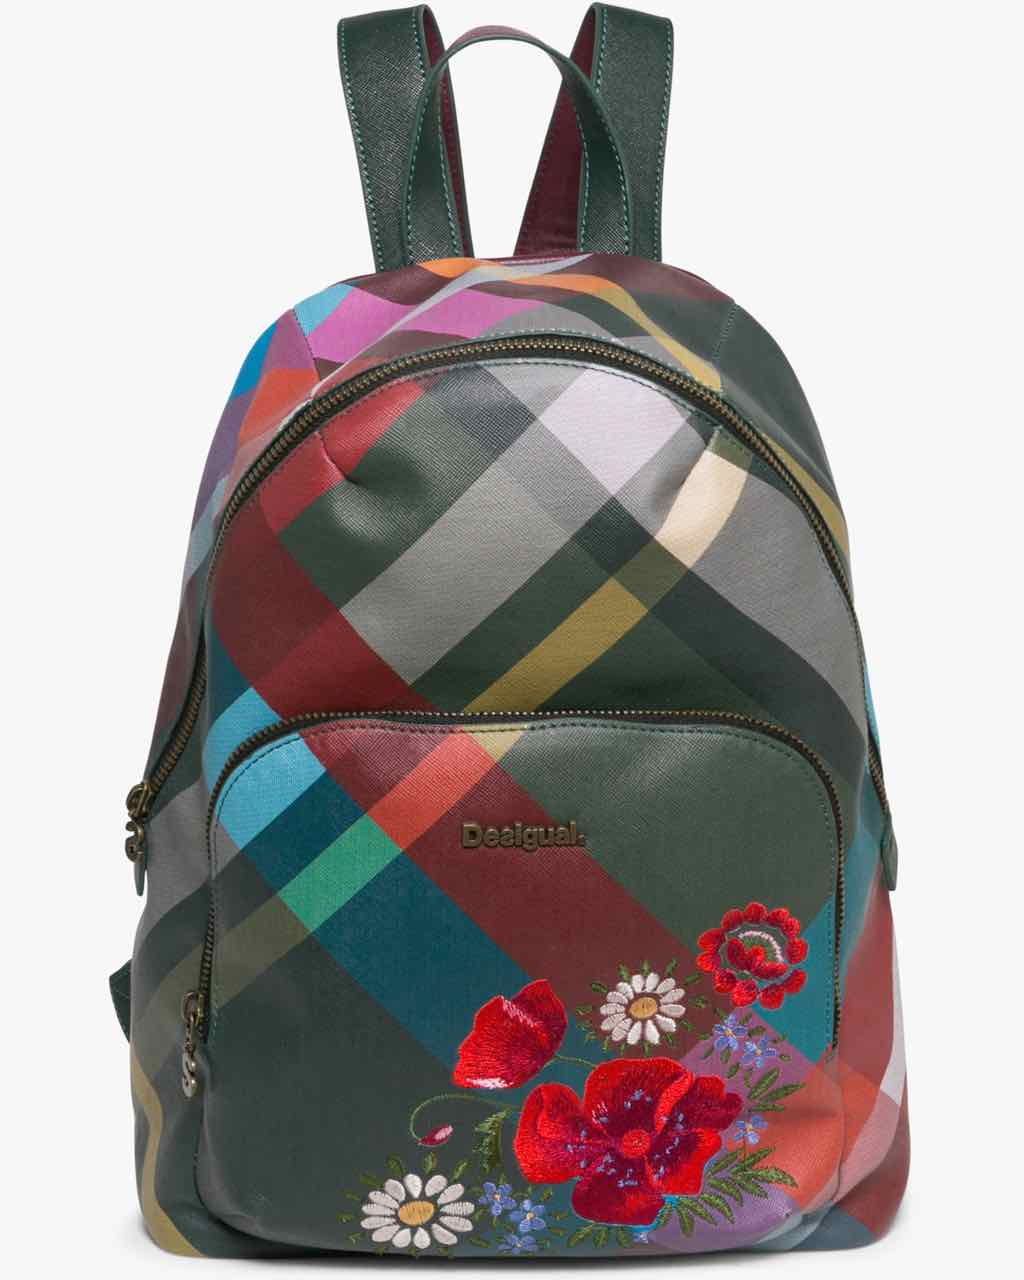 17WAXPPR_4003 Desigual Backpack Lima Mandras Folk Flores Buy Online